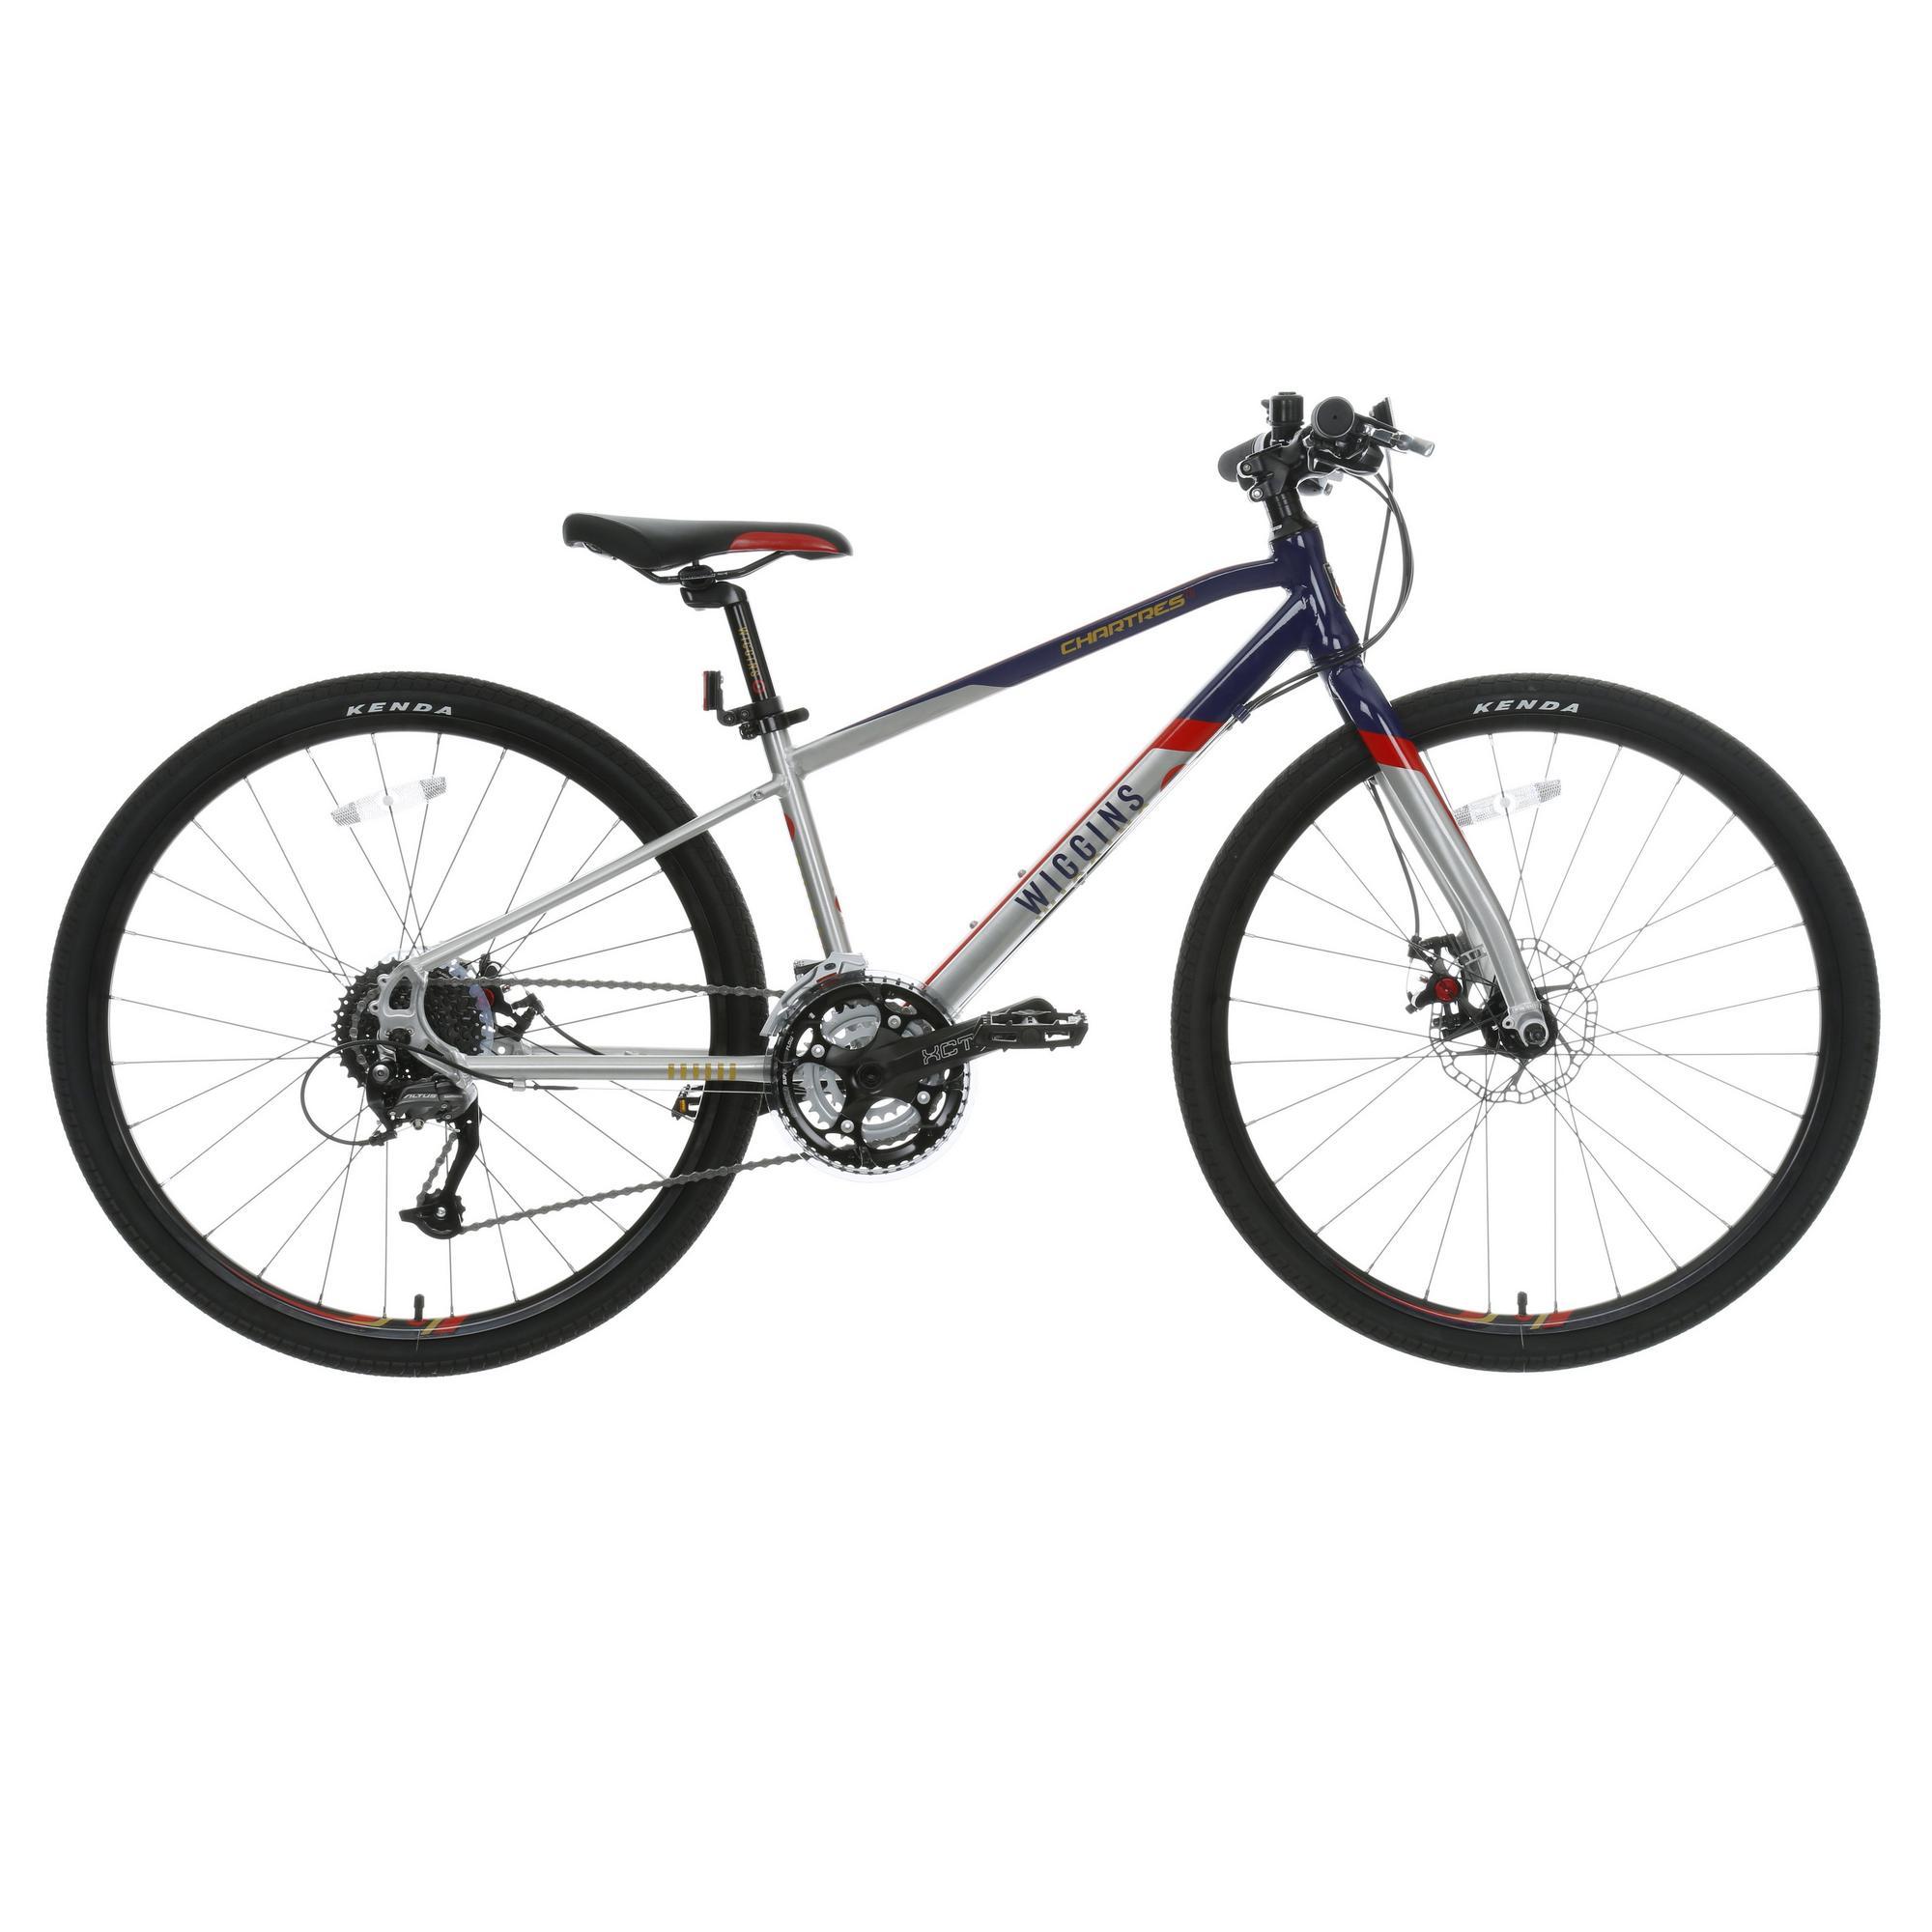 Wiggins Chartres Boys Girls Hybrid Bike Bicycle 27 Shimano